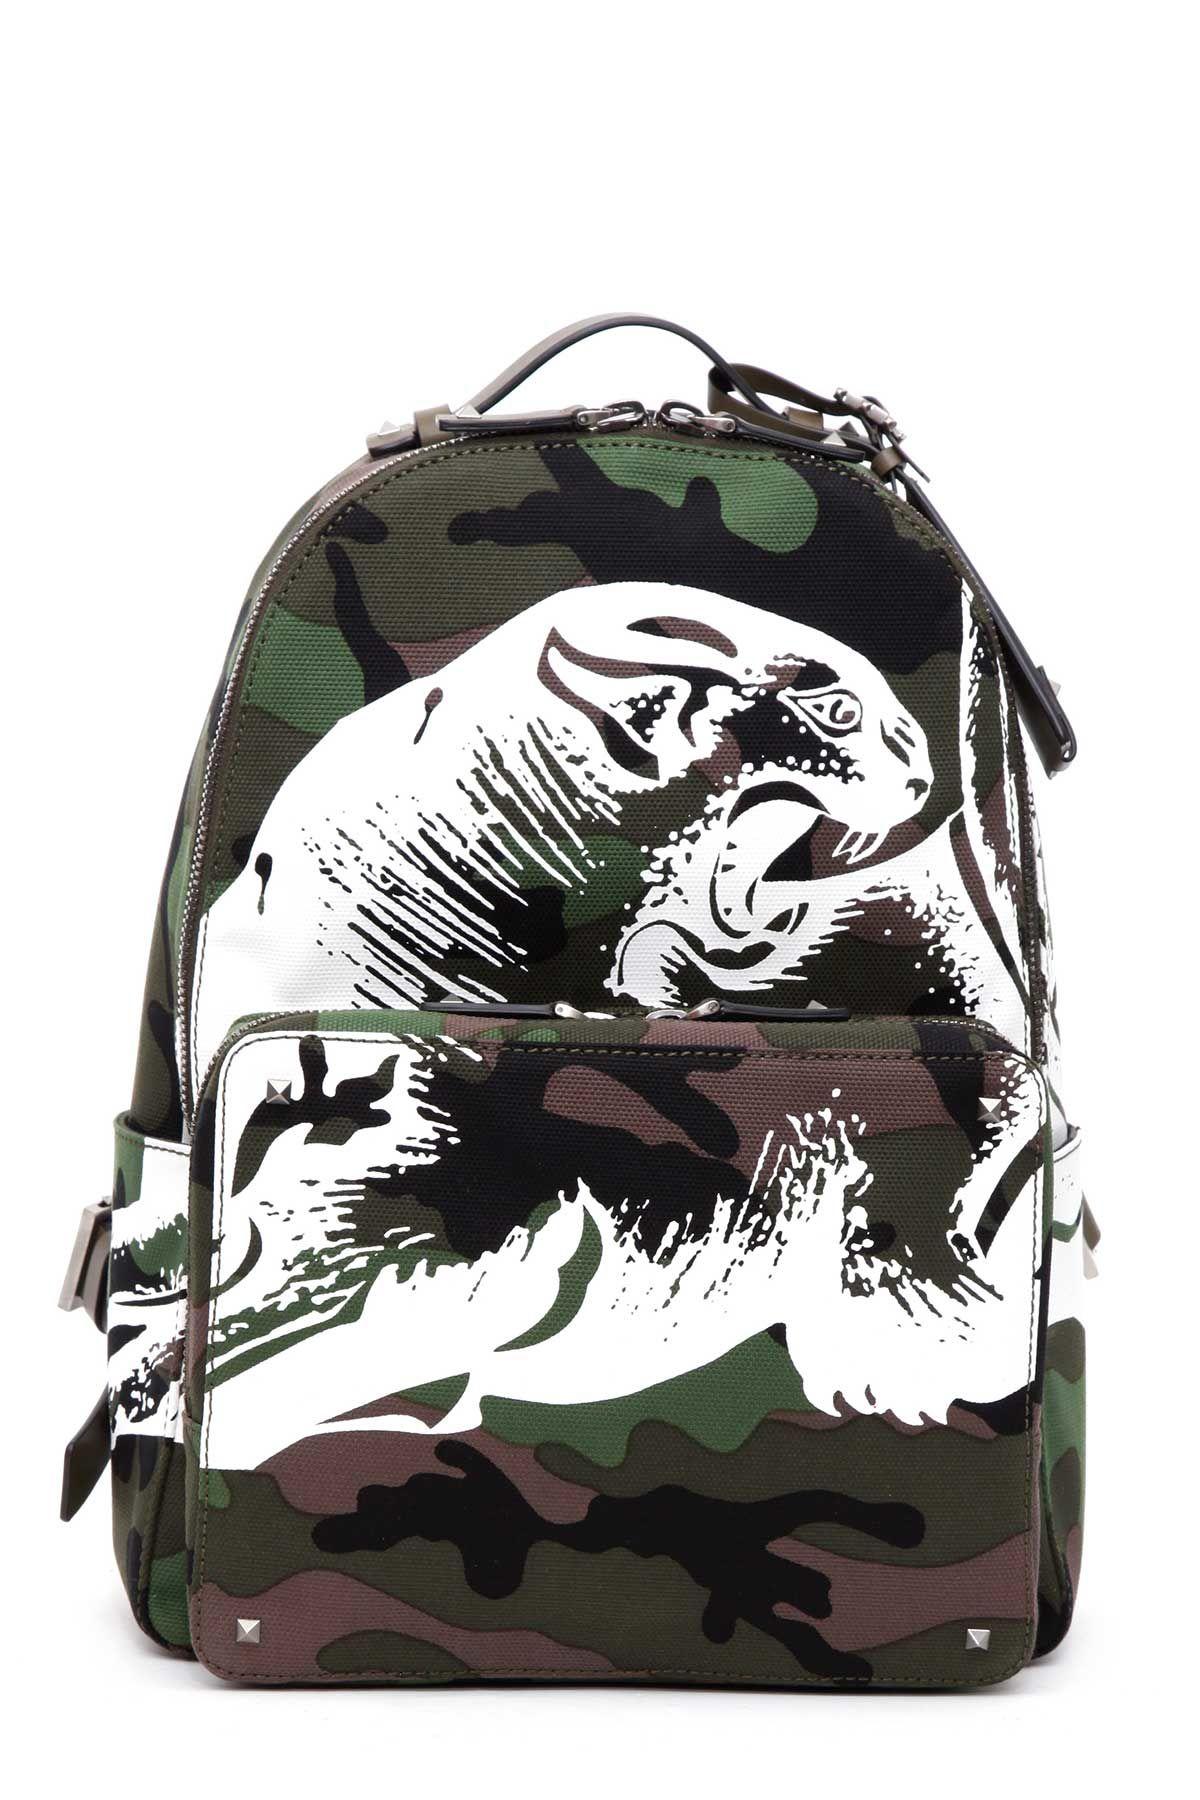 Valentino Garavani camupanther Backpack